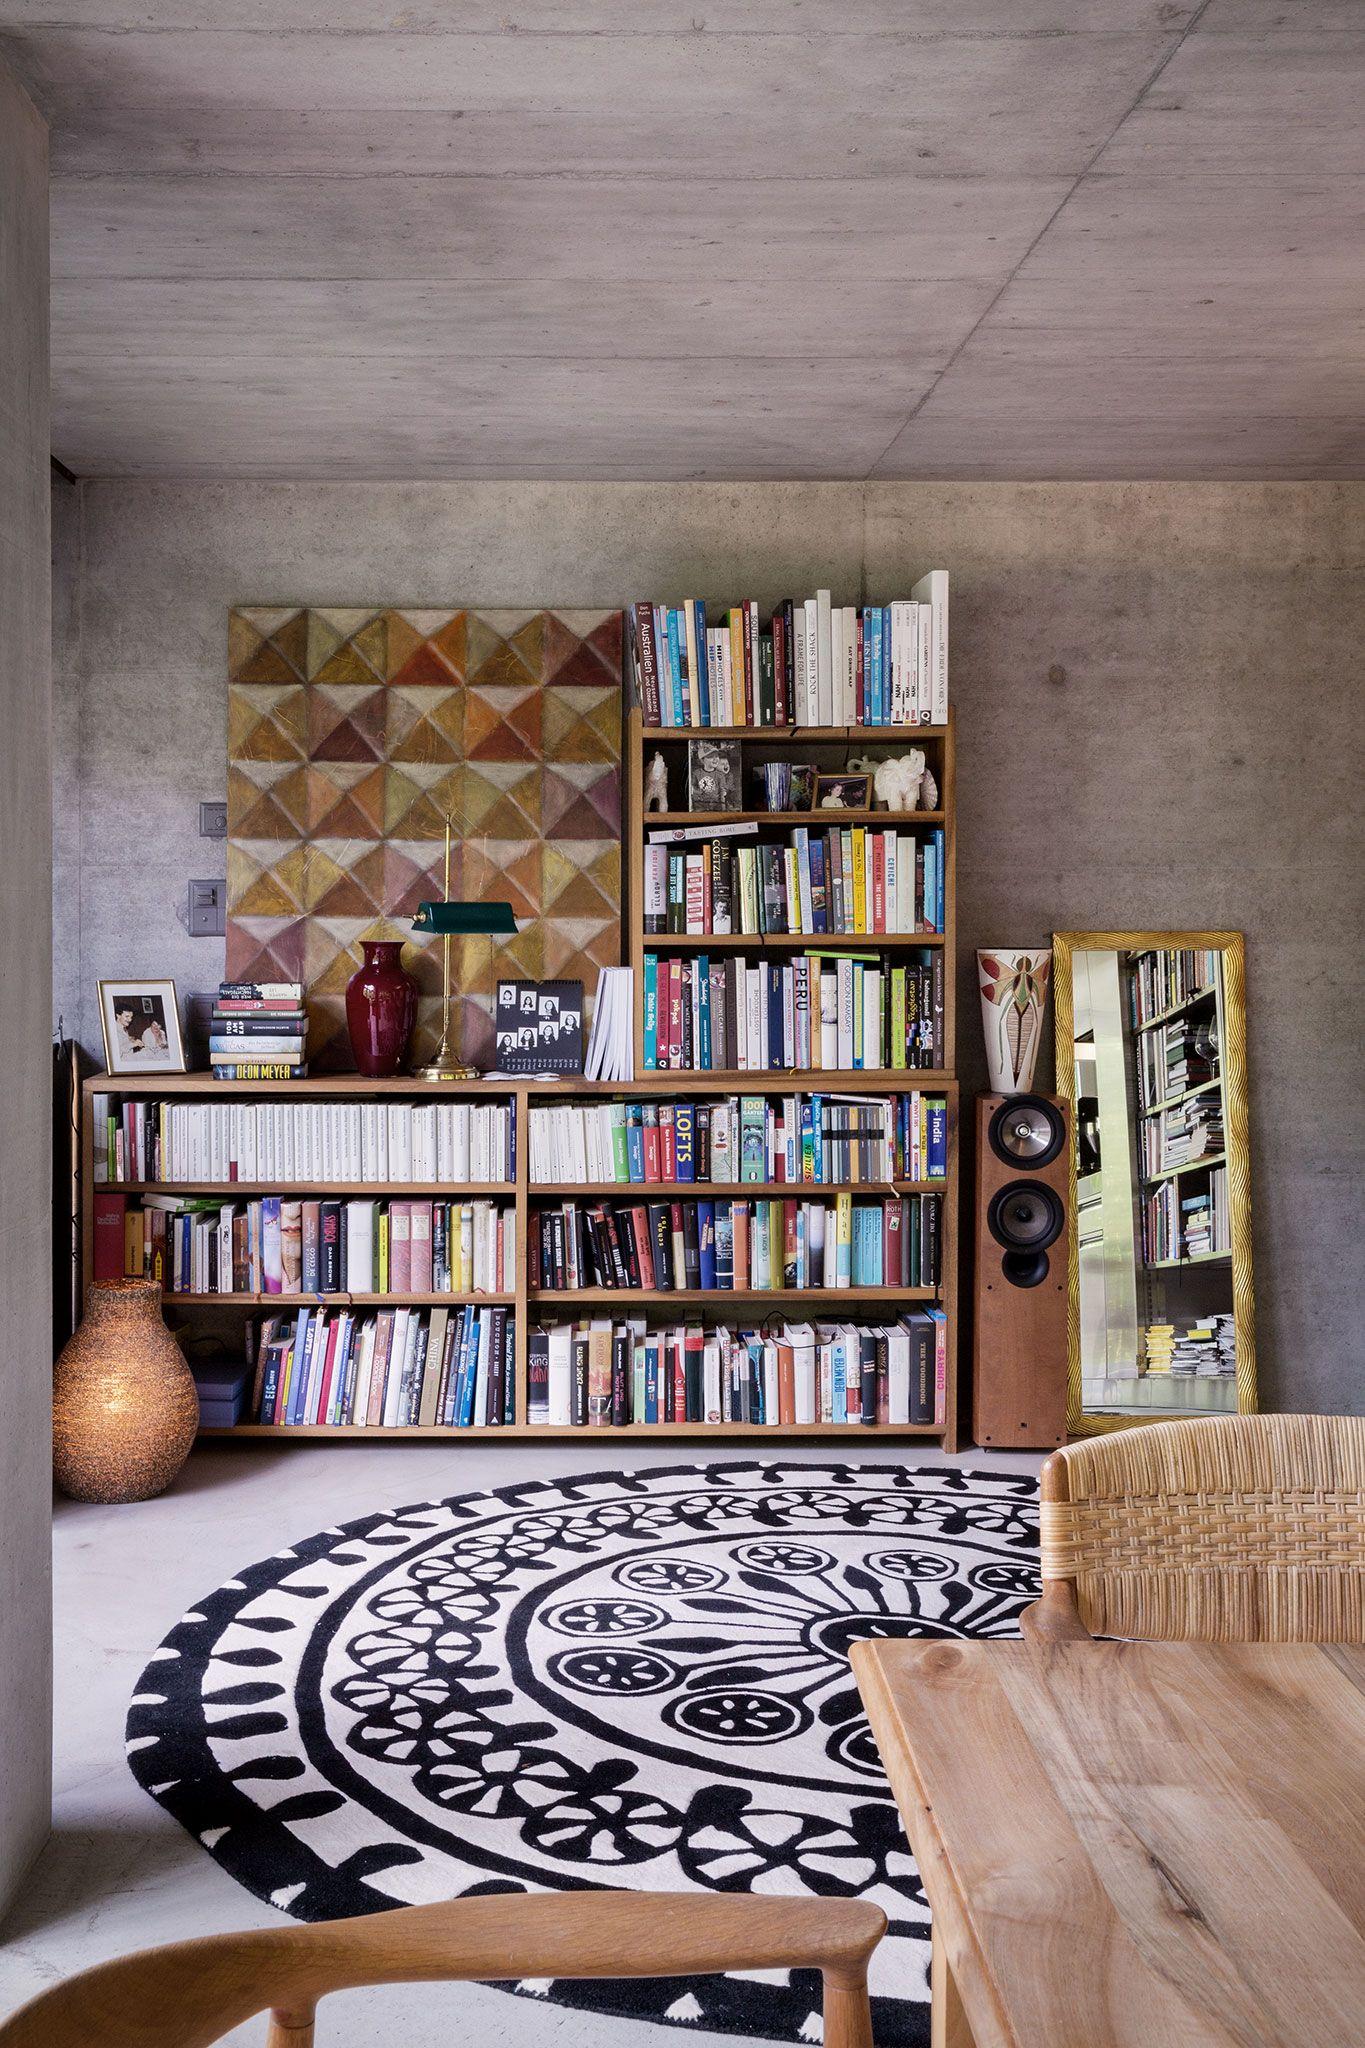 Ein rahmen zu hause design-ideen sweet home richard kägi copyright rita palanikumar  regale